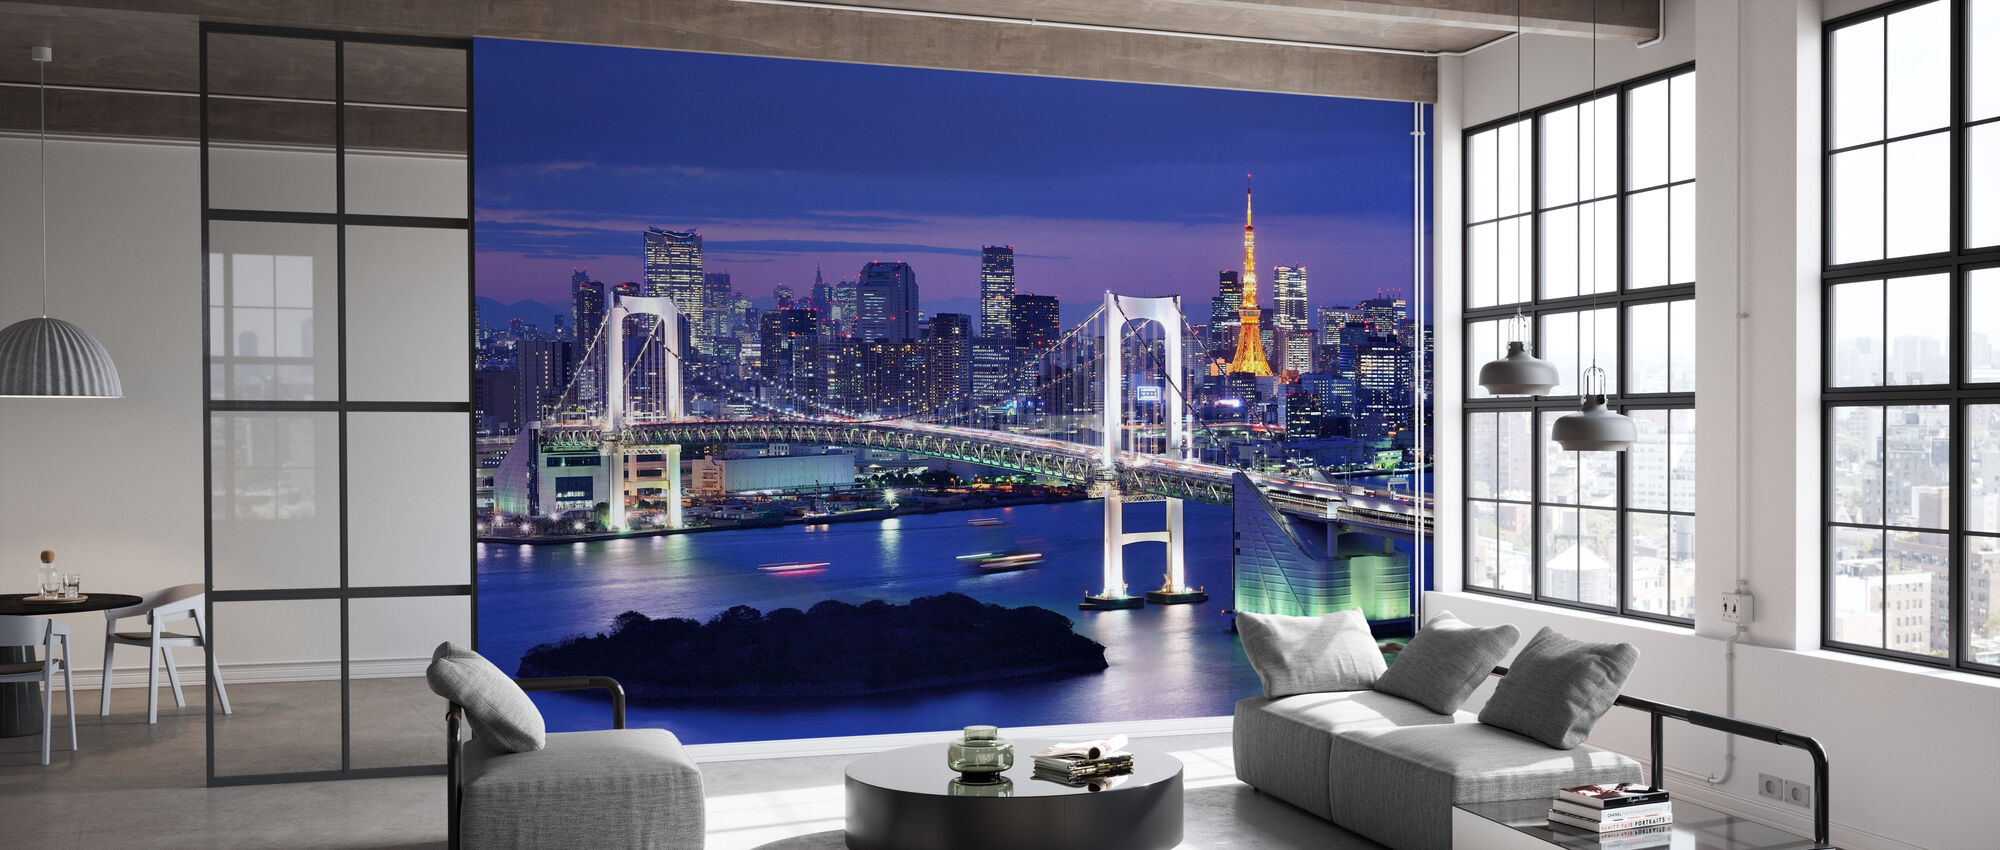 Rainbow Bridge and Tokyo Tower - Wallpaper - Office